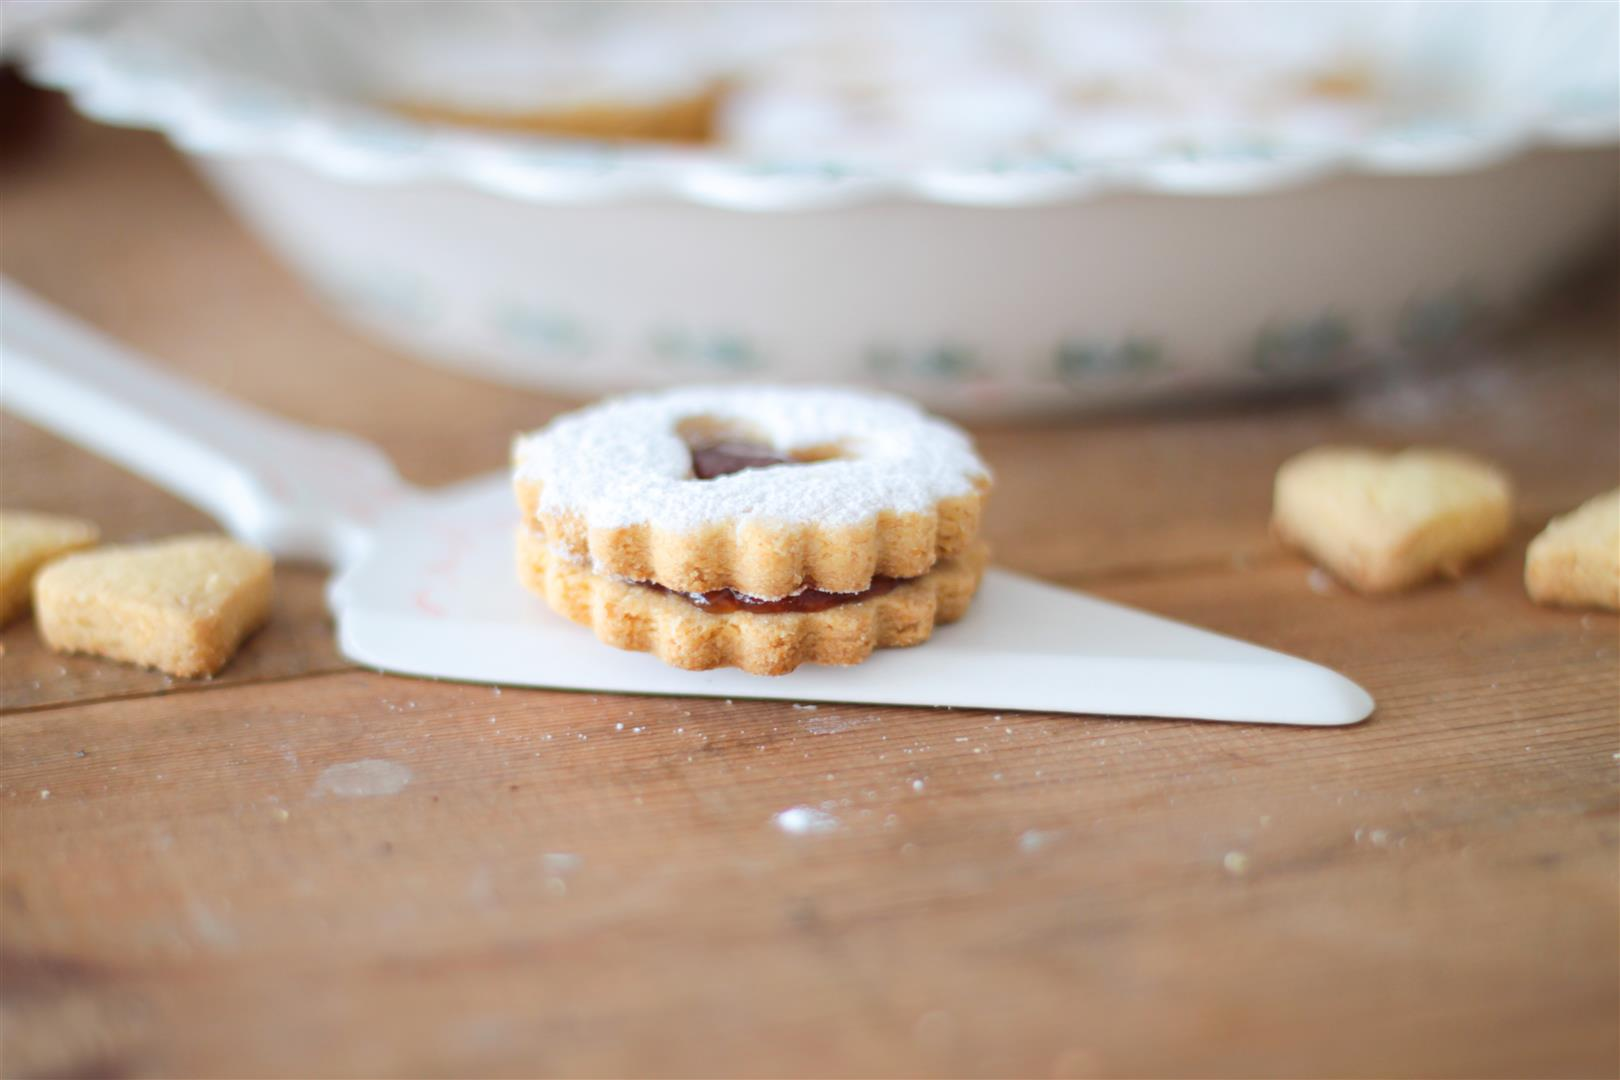 receta-galletas-mermelada-sin-gluten-celiacos-(1)